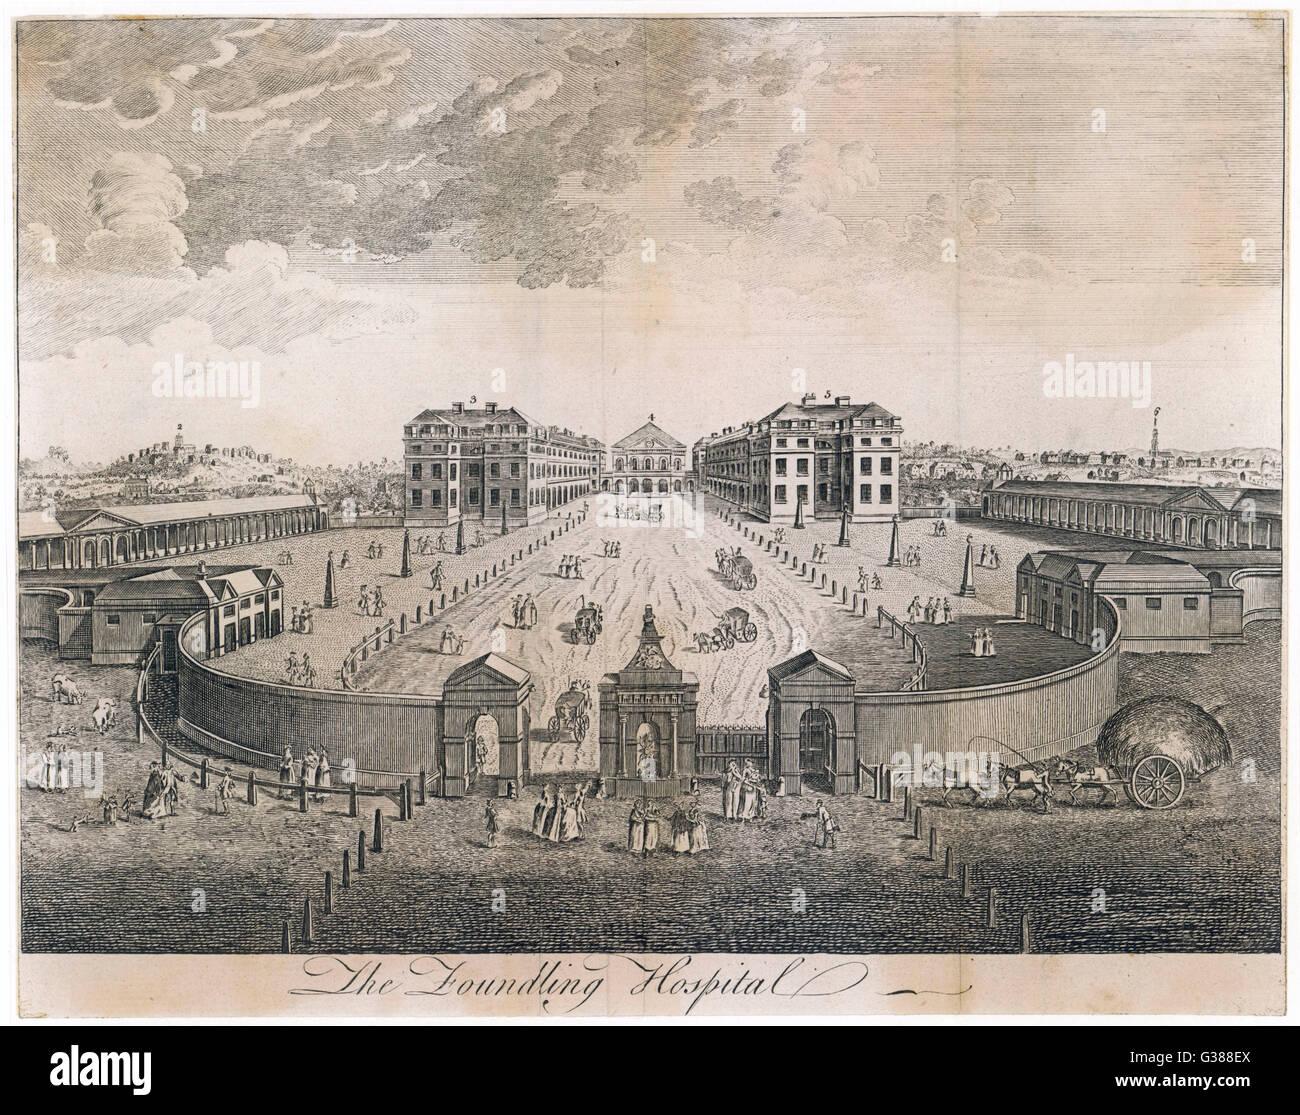 Something London foundling hospital that